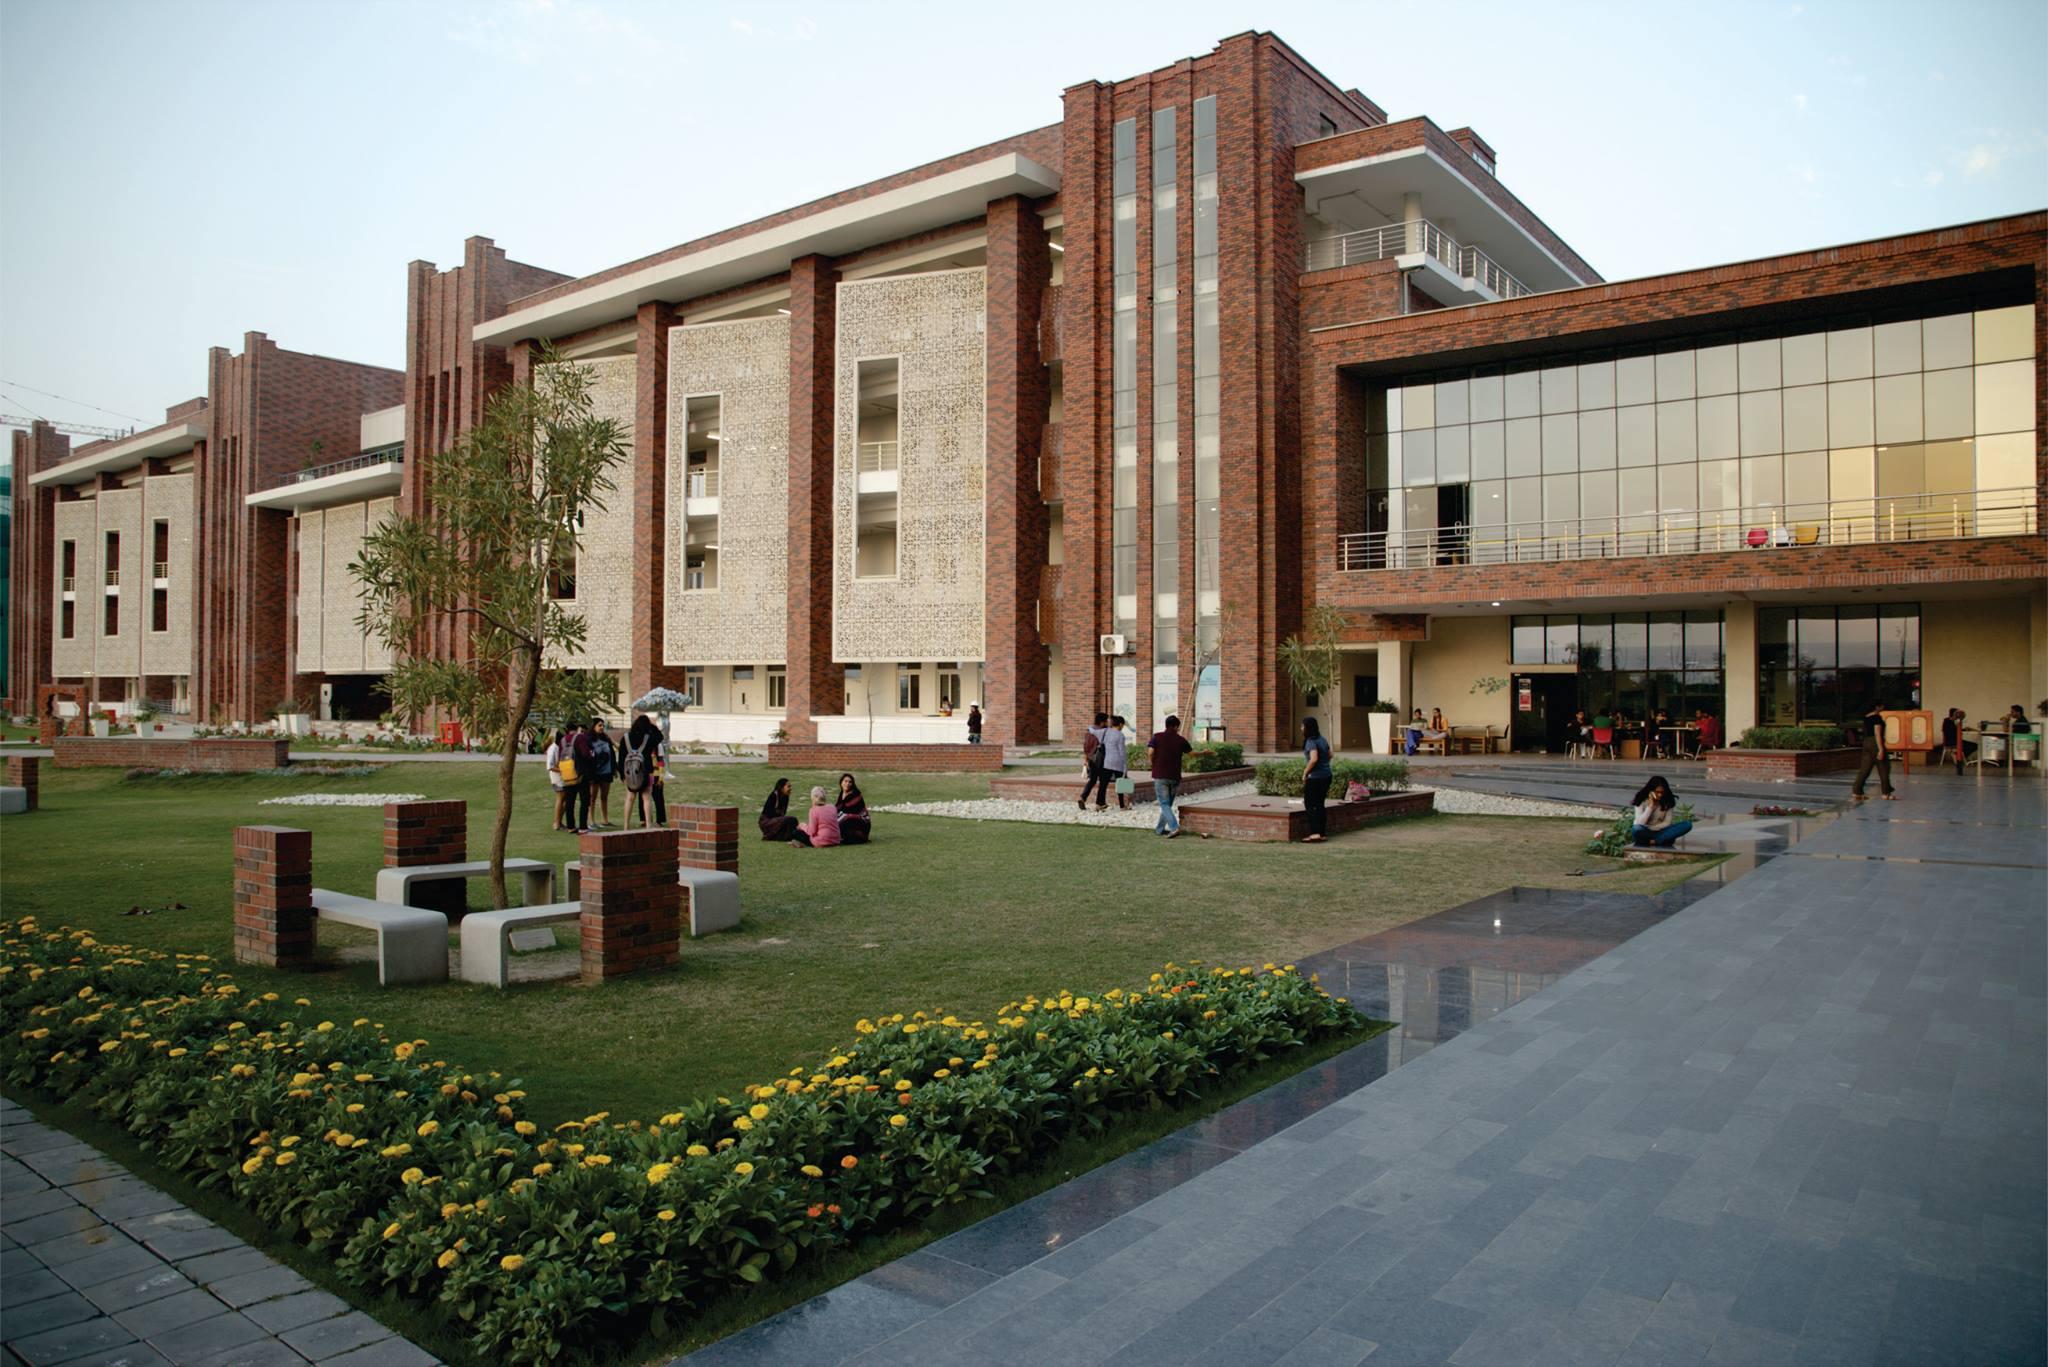 #MeToo: How Ashoka University Has Let The Accused Professor Go Scott-Free